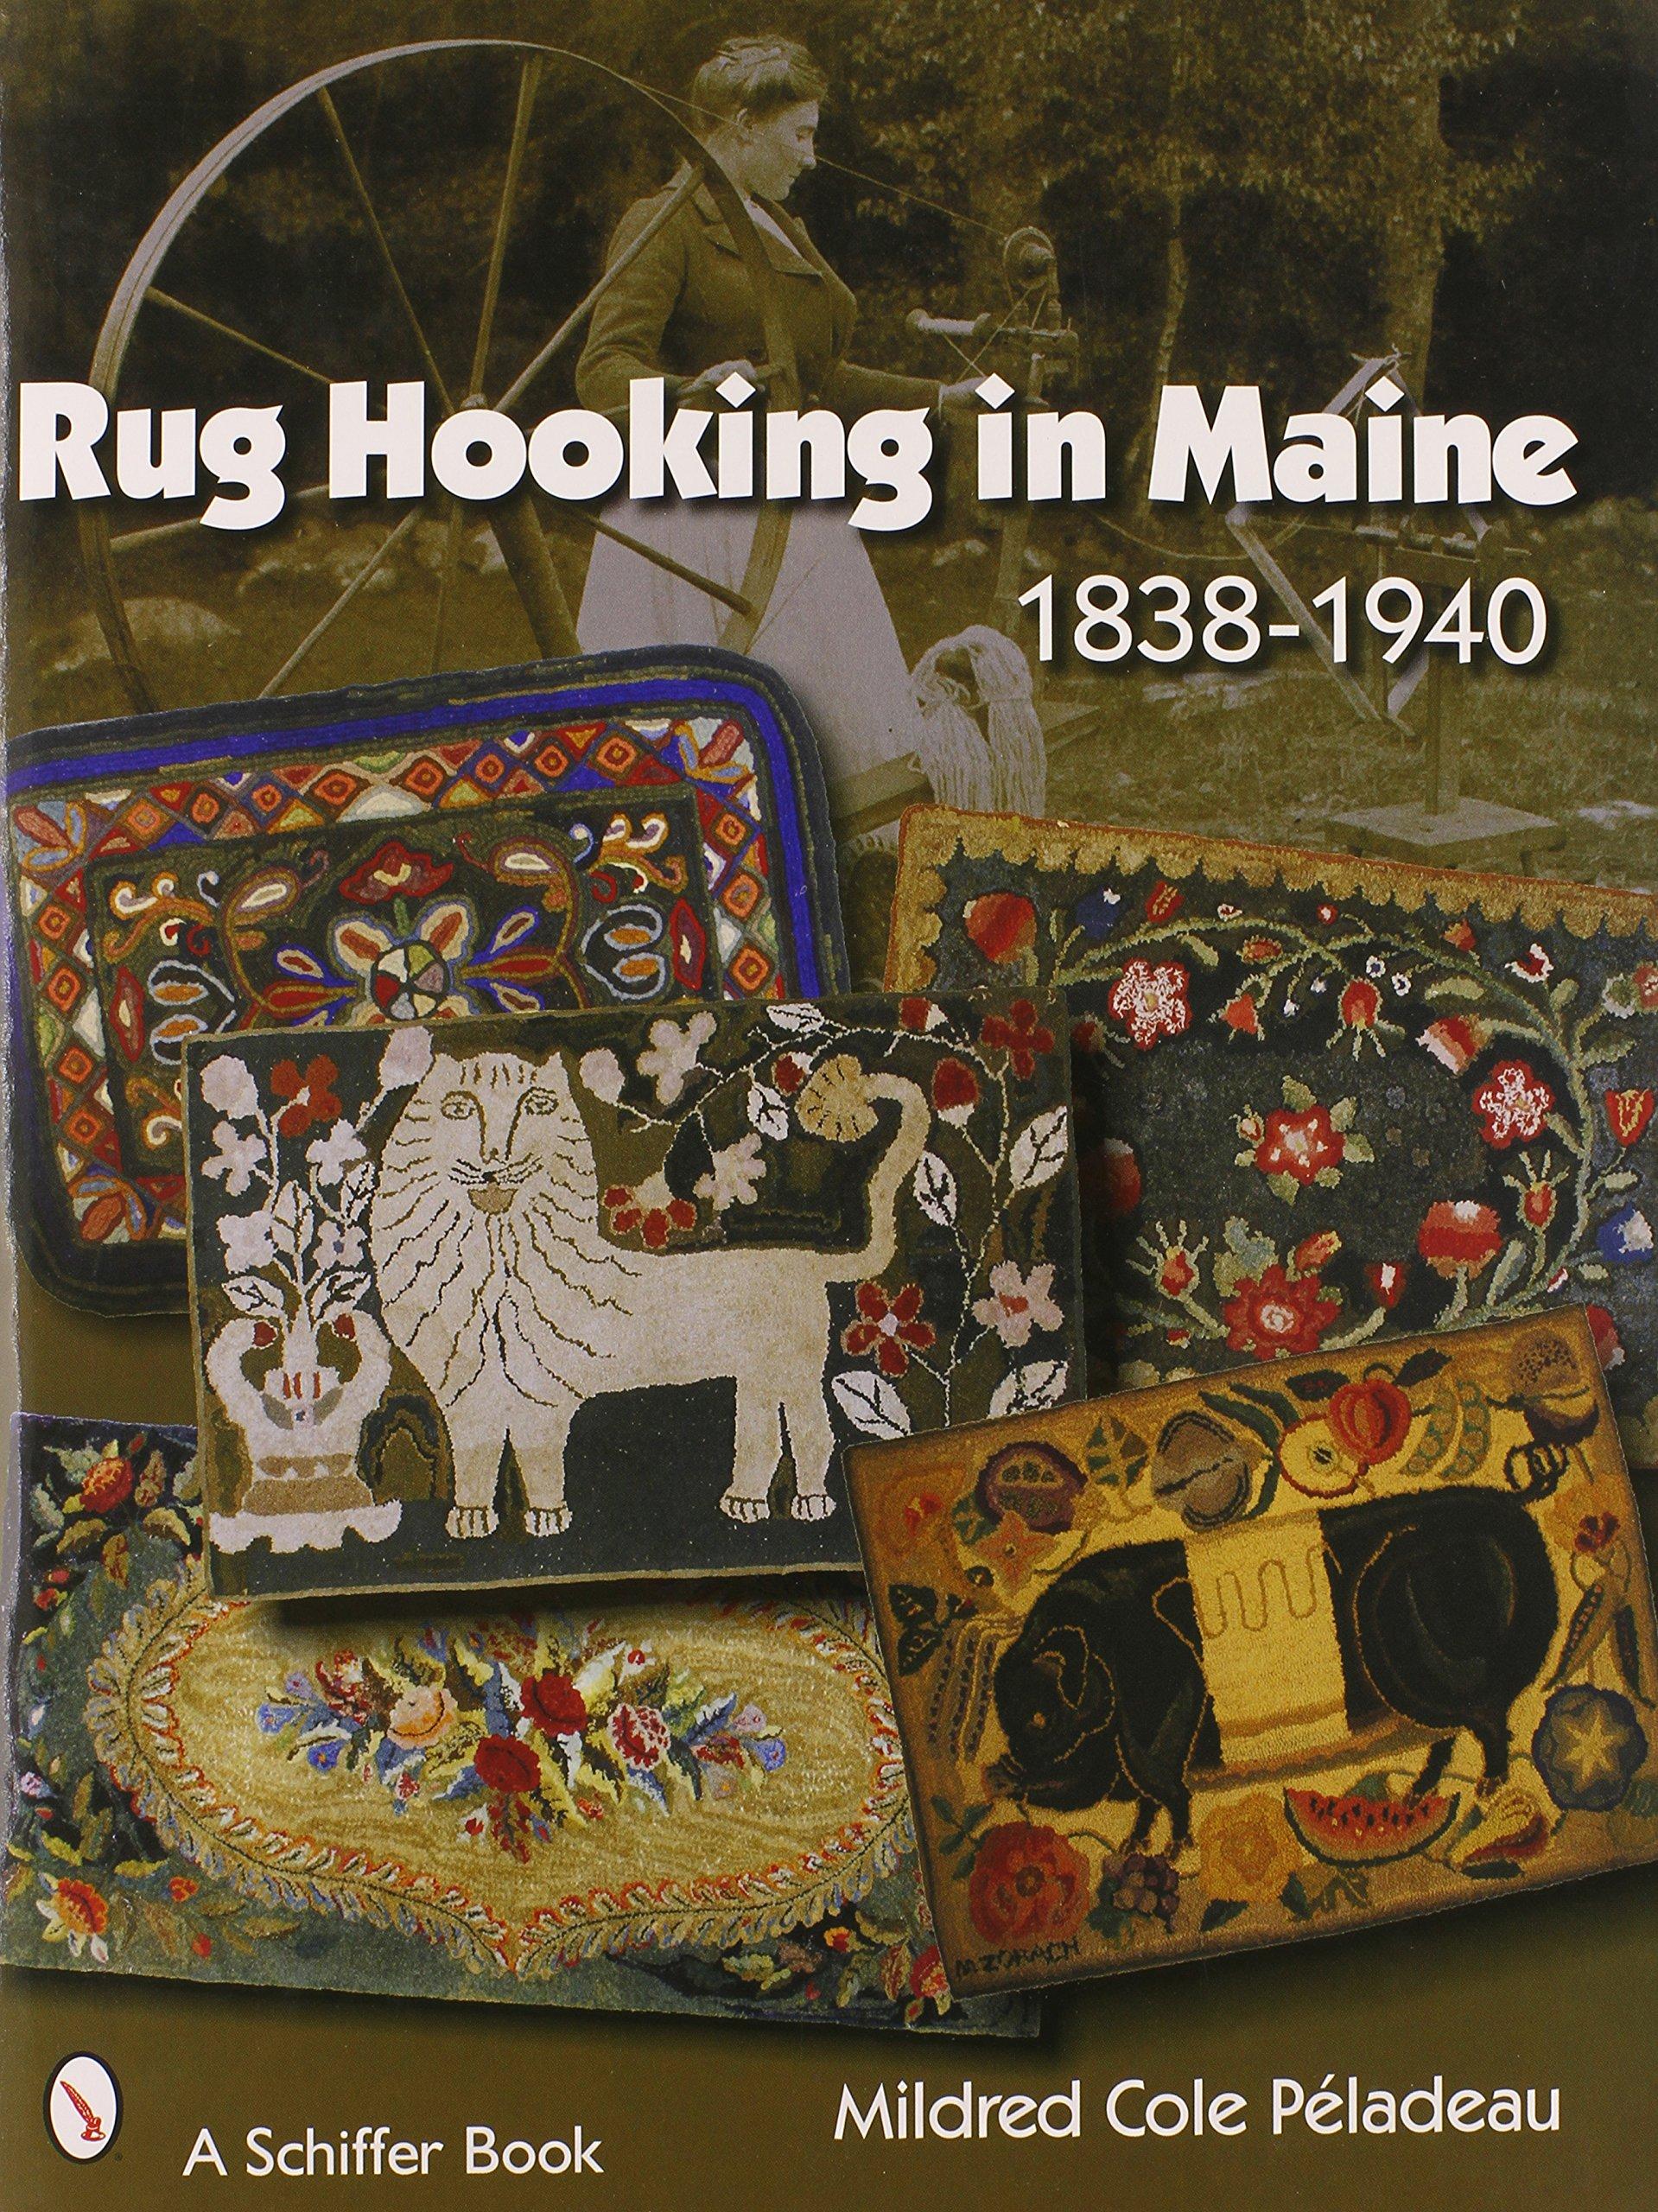 Rug Hooking In Maine: 1838-1940: Mildred Cole Peladeau: 9780764328824:  Amazon.com: Books